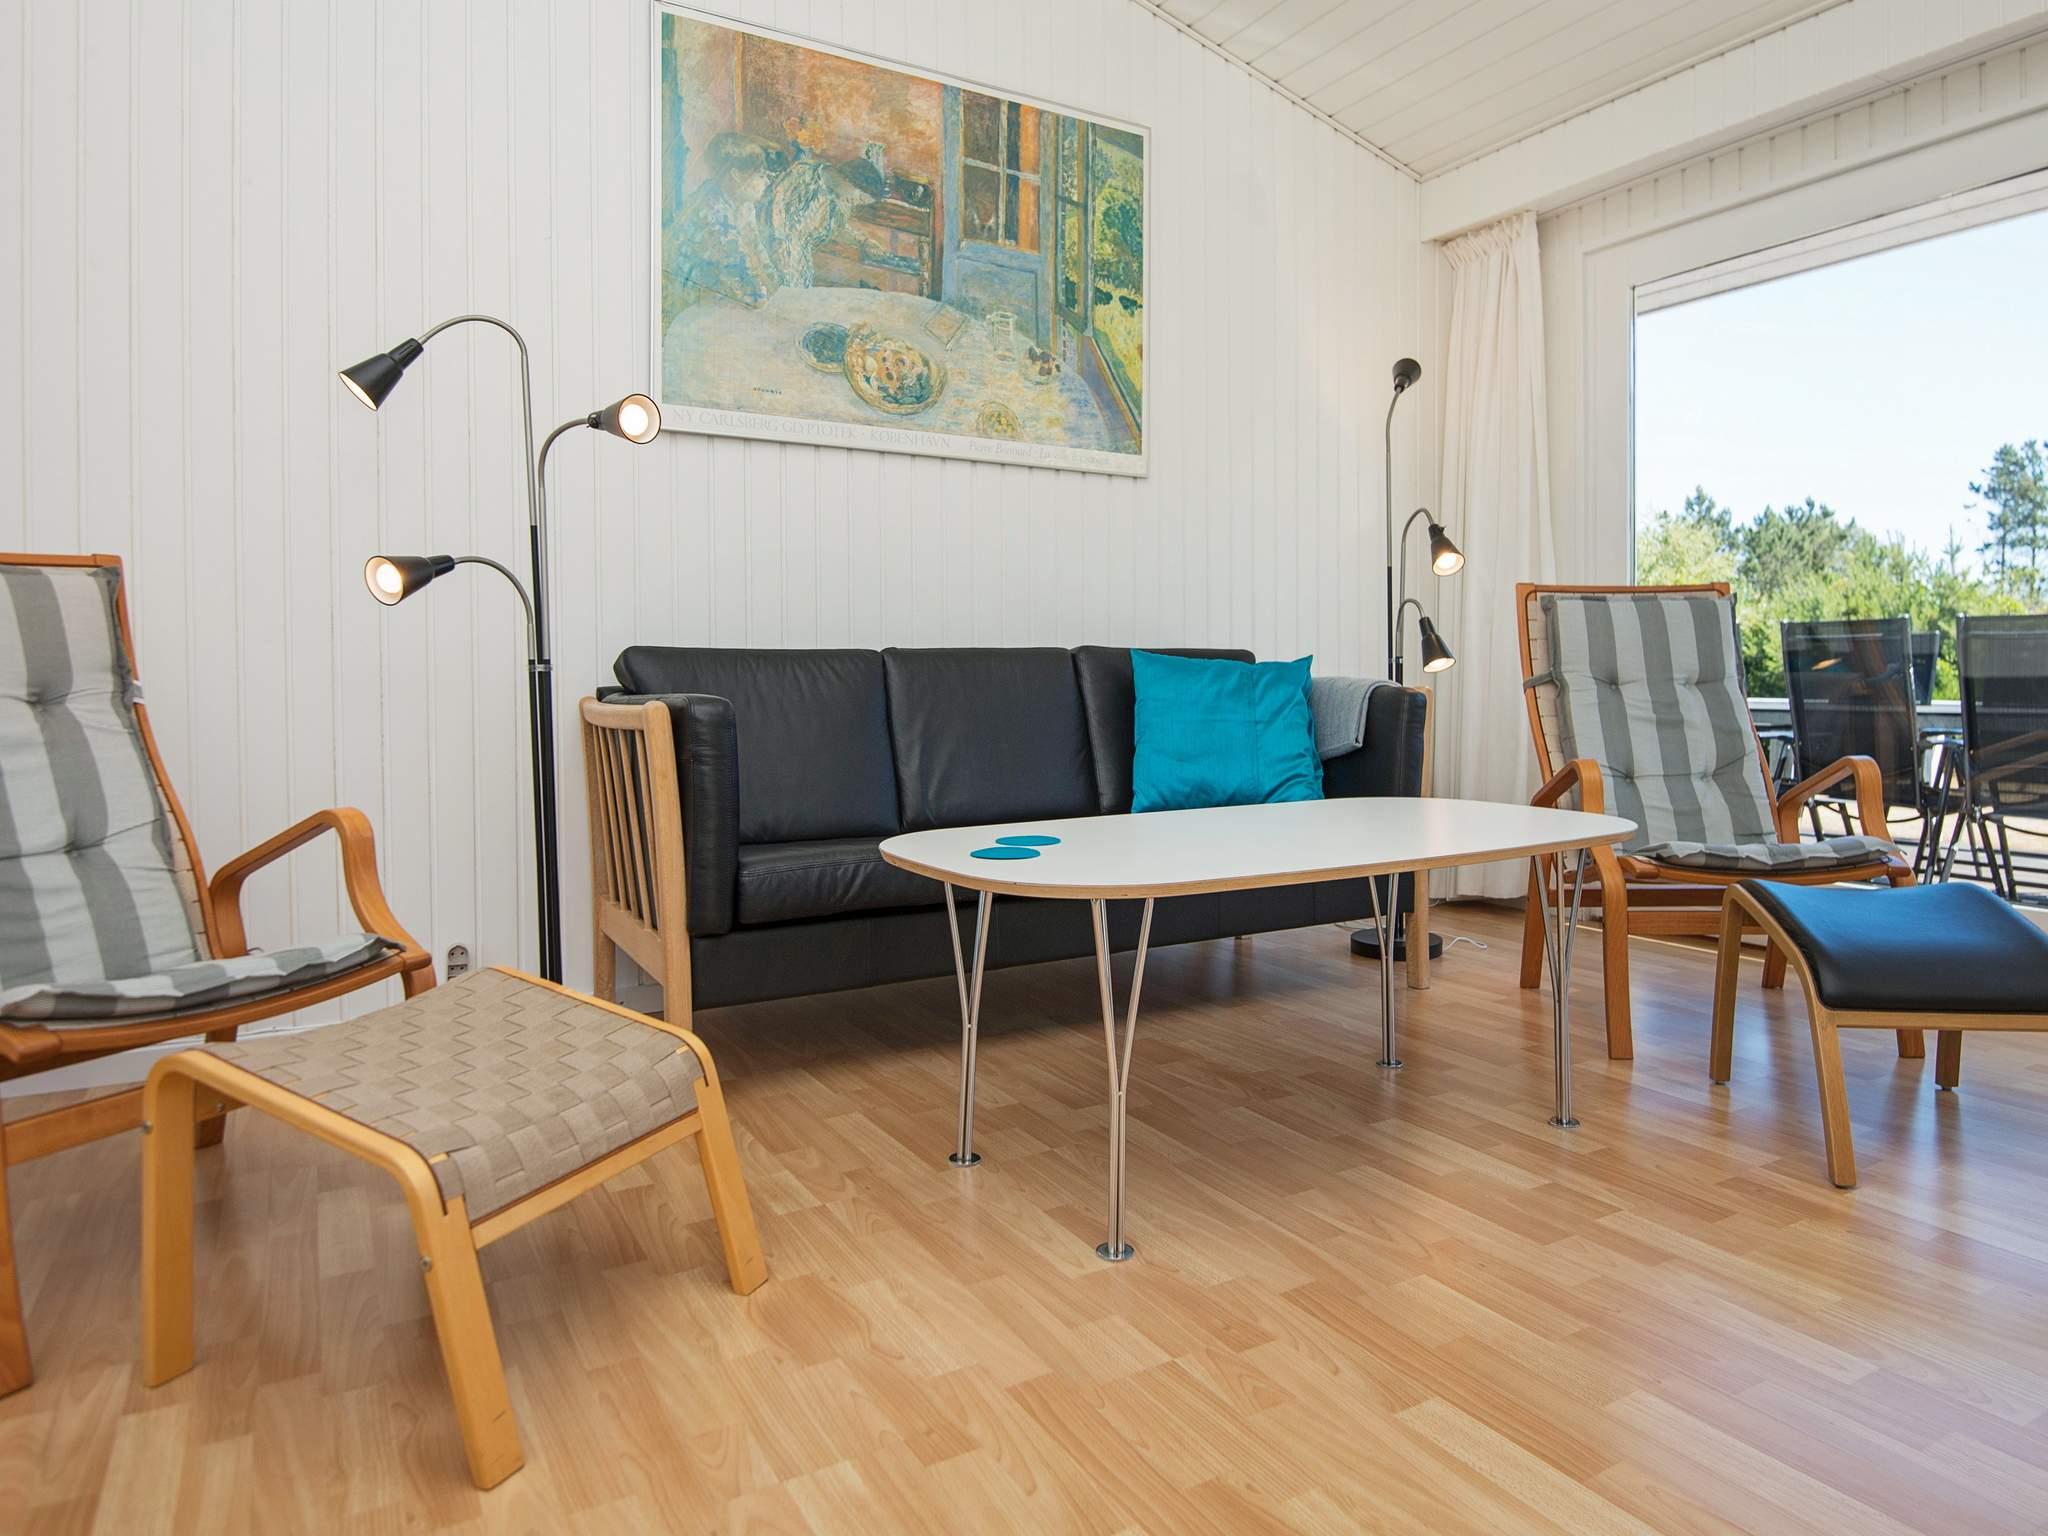 Maison de vacances Helgenæs (978615), Knebel, , Mer Baltique danoise, Danemark, image 2